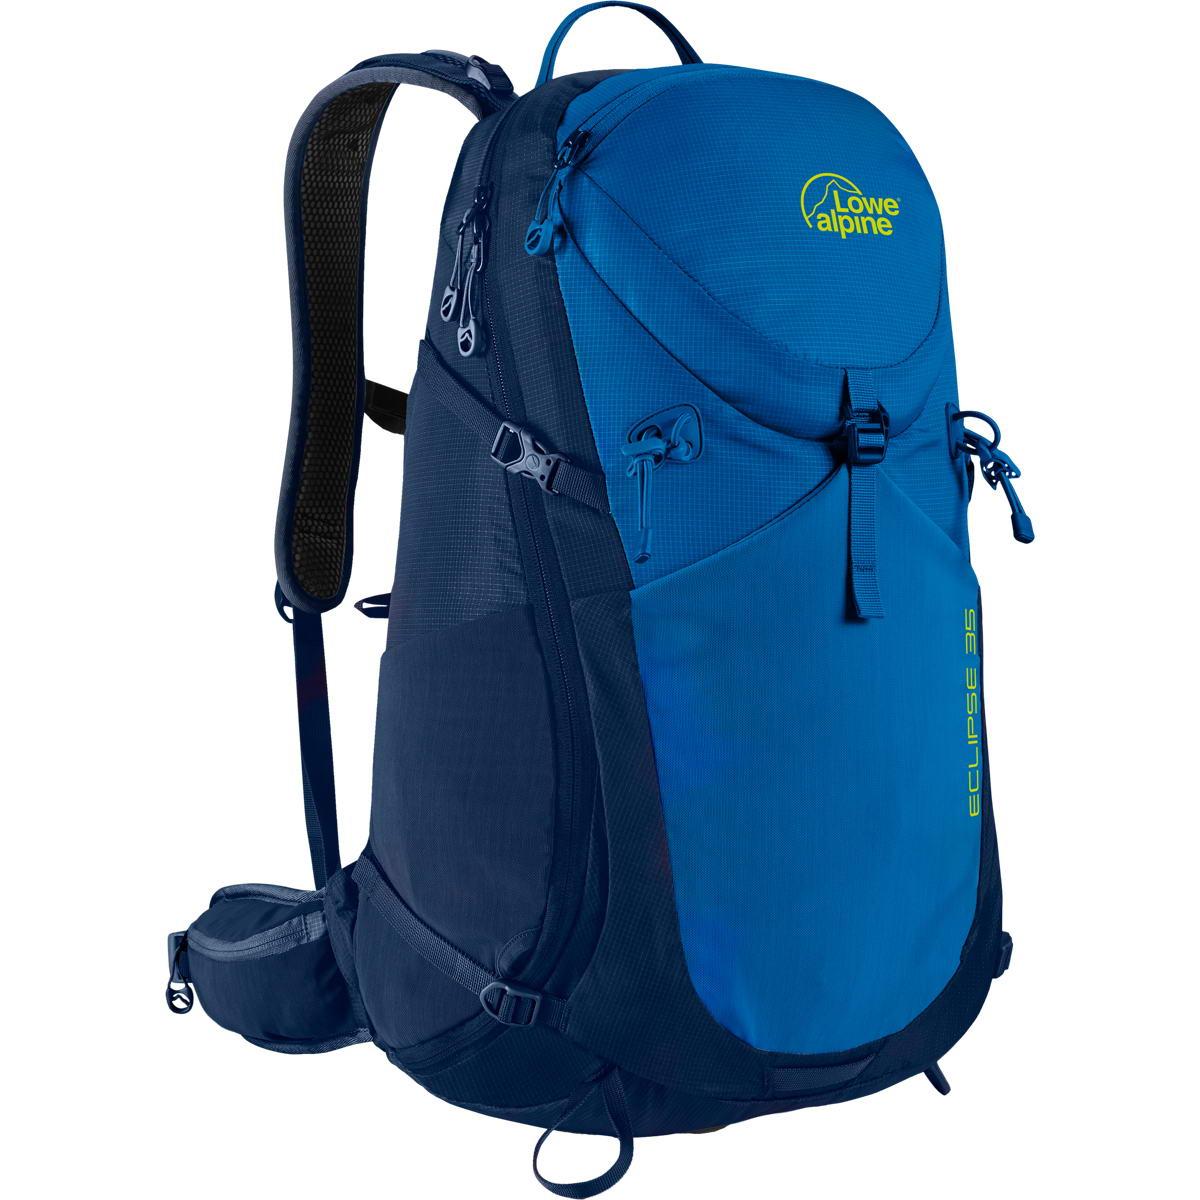 Lowe Alpine 後背包/登山背包/單車包/小背包 Eclipse 35 FTE45 GI 藍